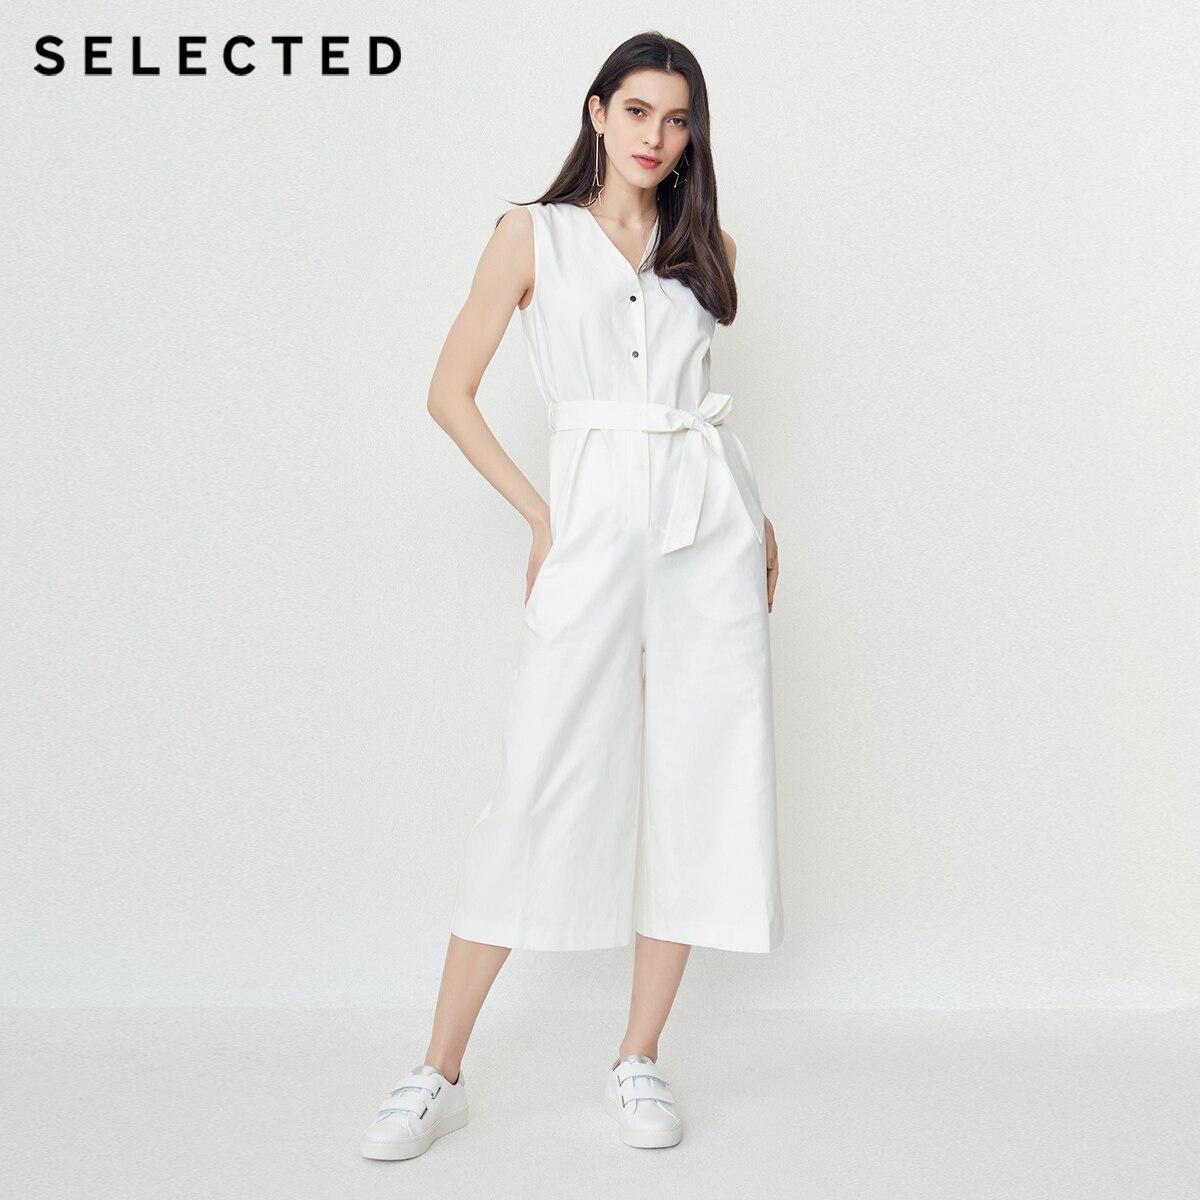 SELECTED women s new V neck sleeveless loose high waist wide leg casual pants S 418244507